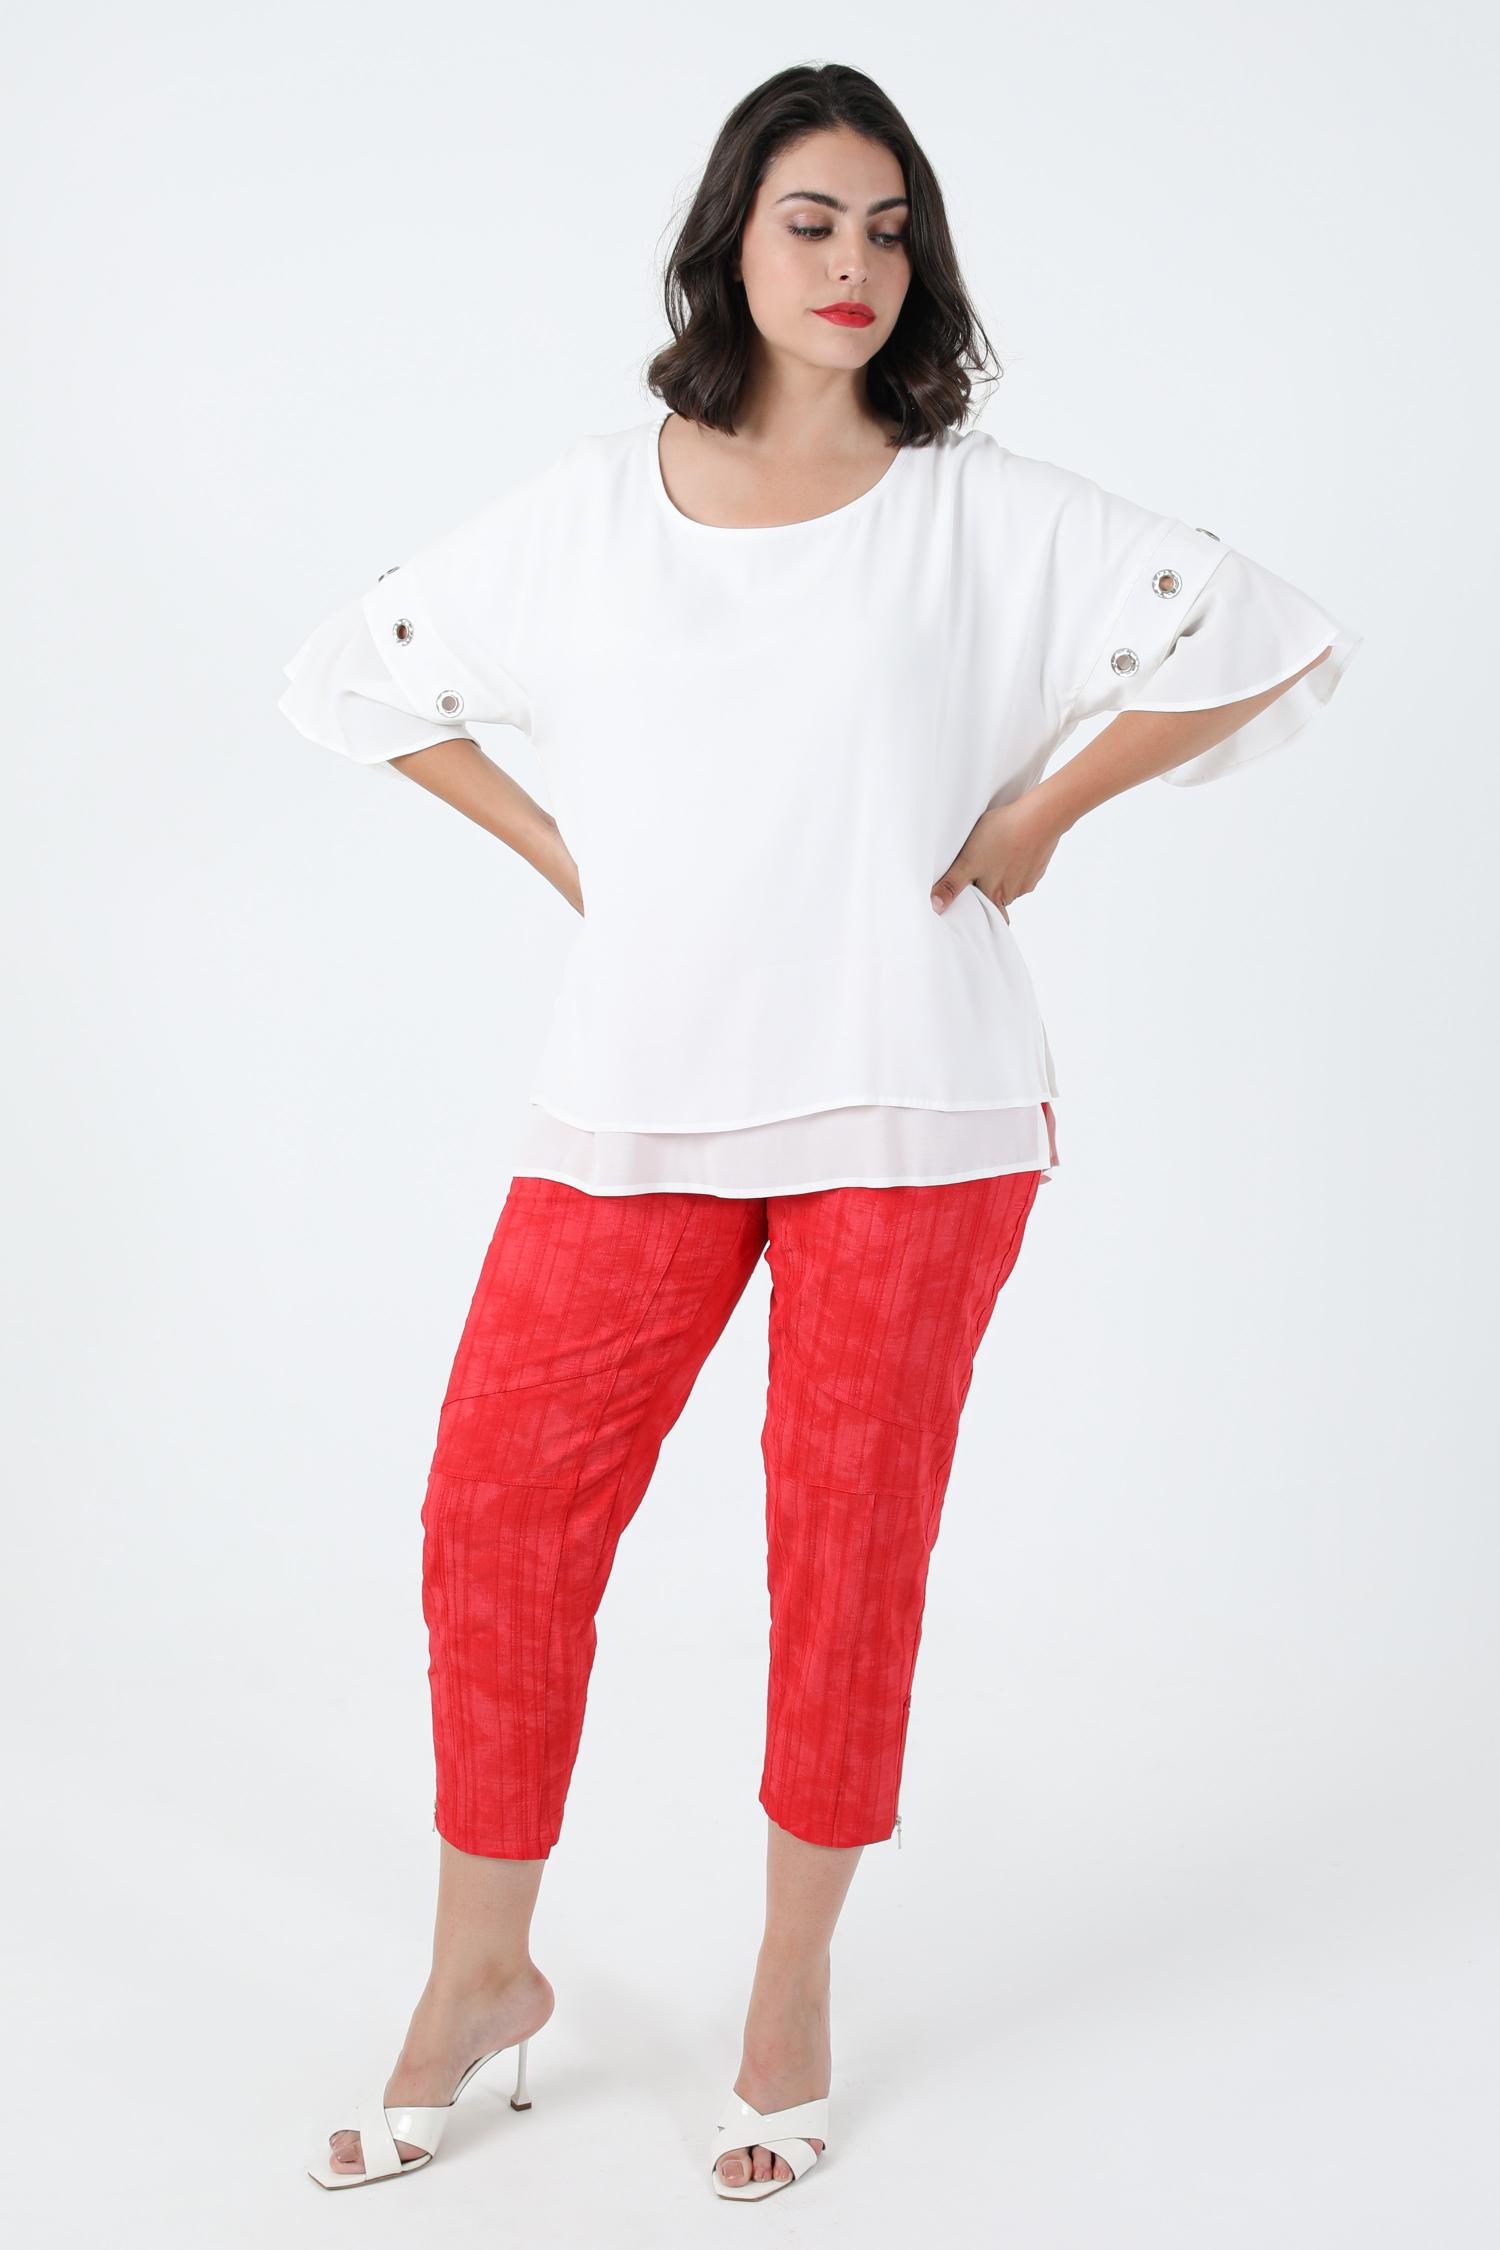 Plain textured pants